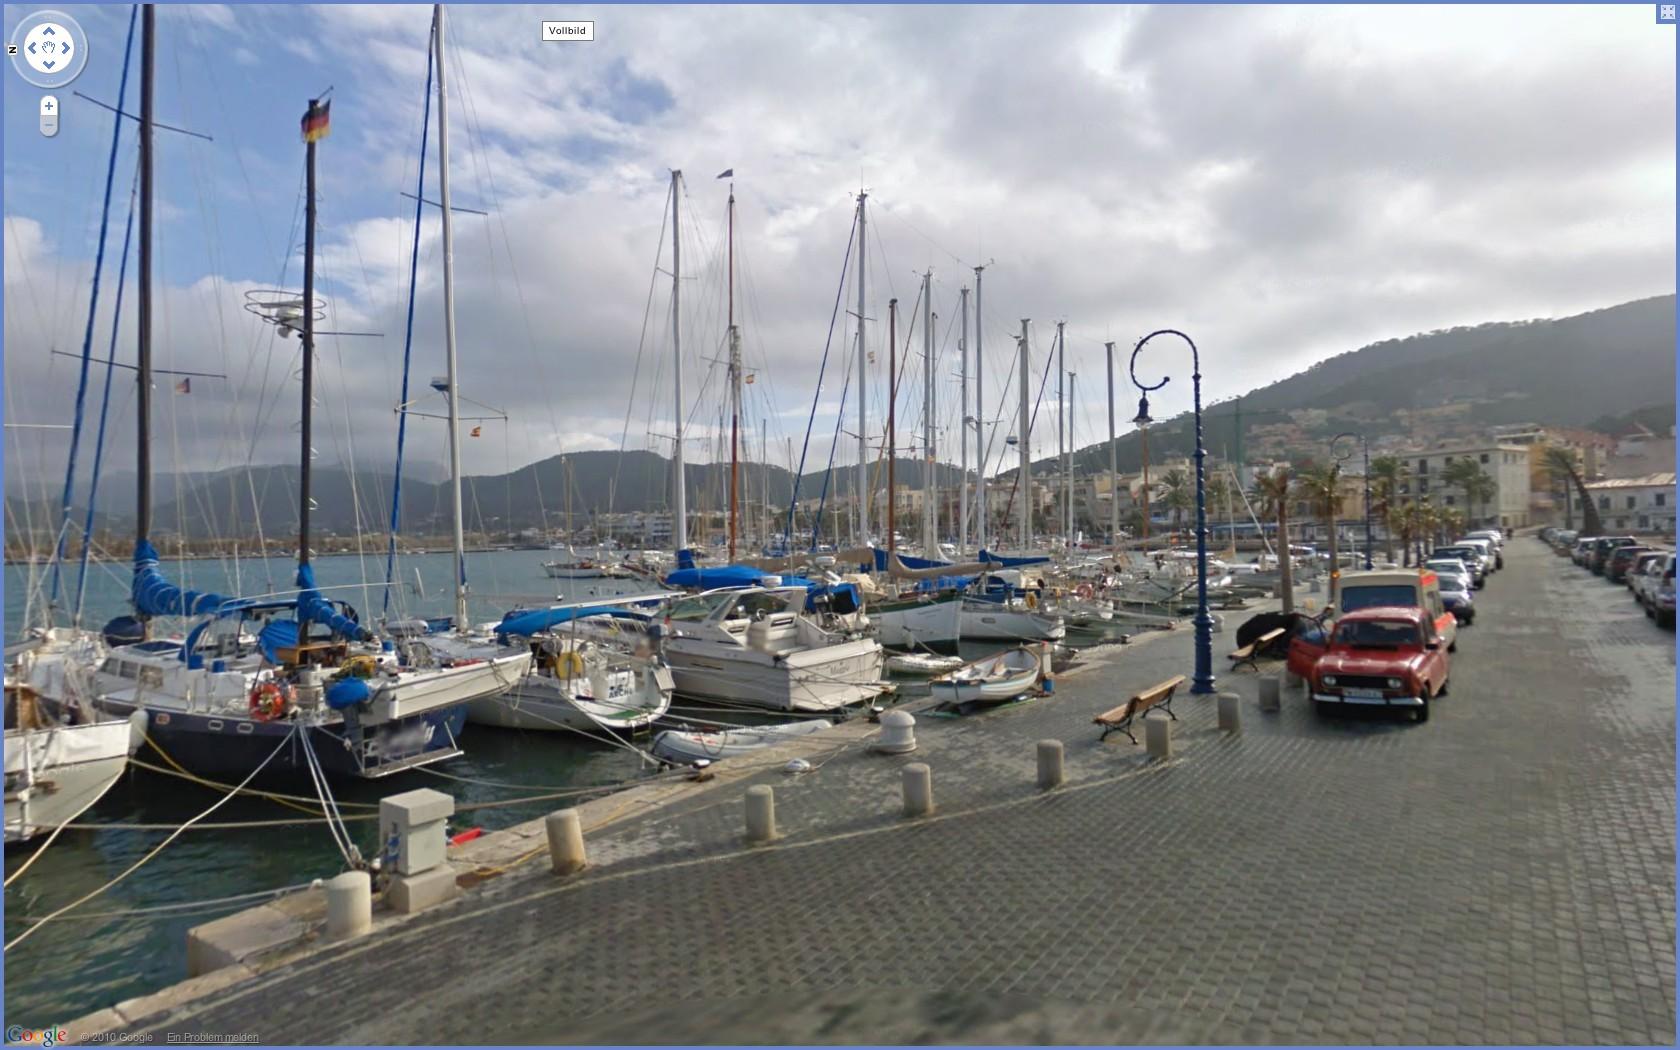 Street View: Das eigene Haus kann ab sofort verpixelt werden - Google Street View: Port s'Andratx (Mallorca)